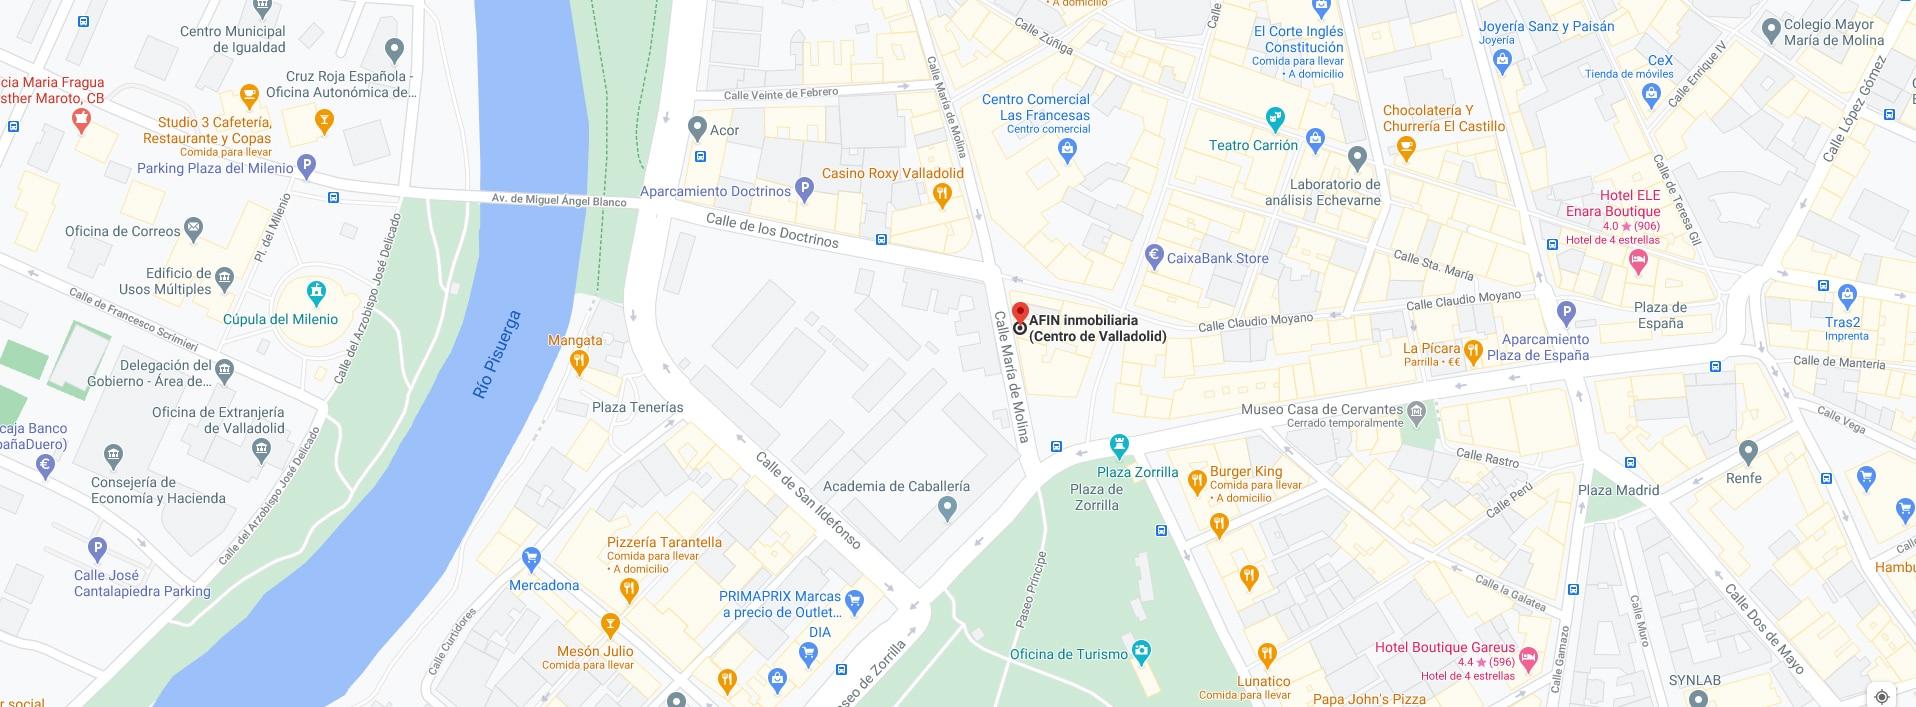 Mapa-AFIN-centro